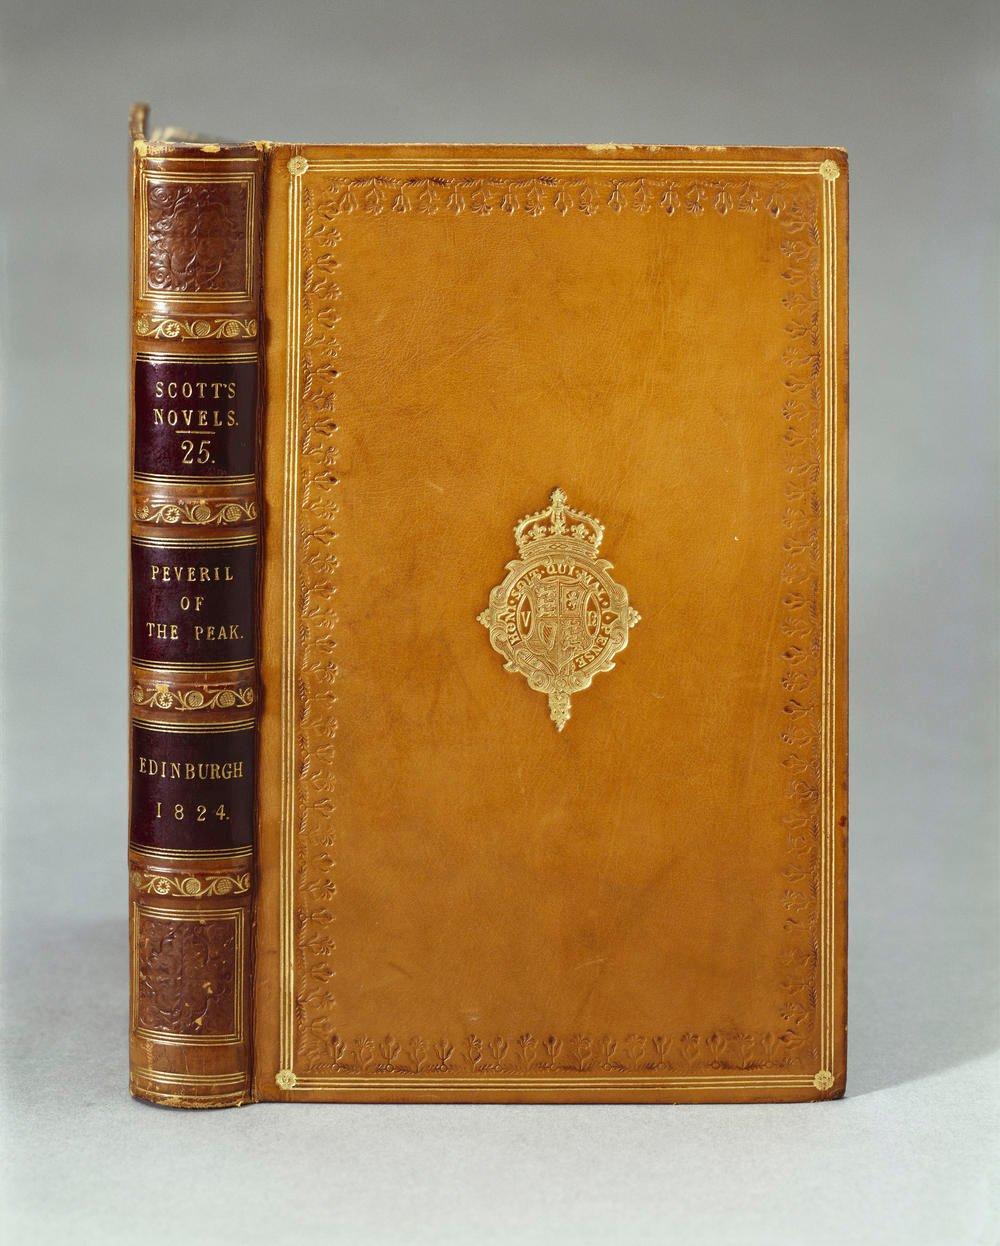 Novel by Walter Scott